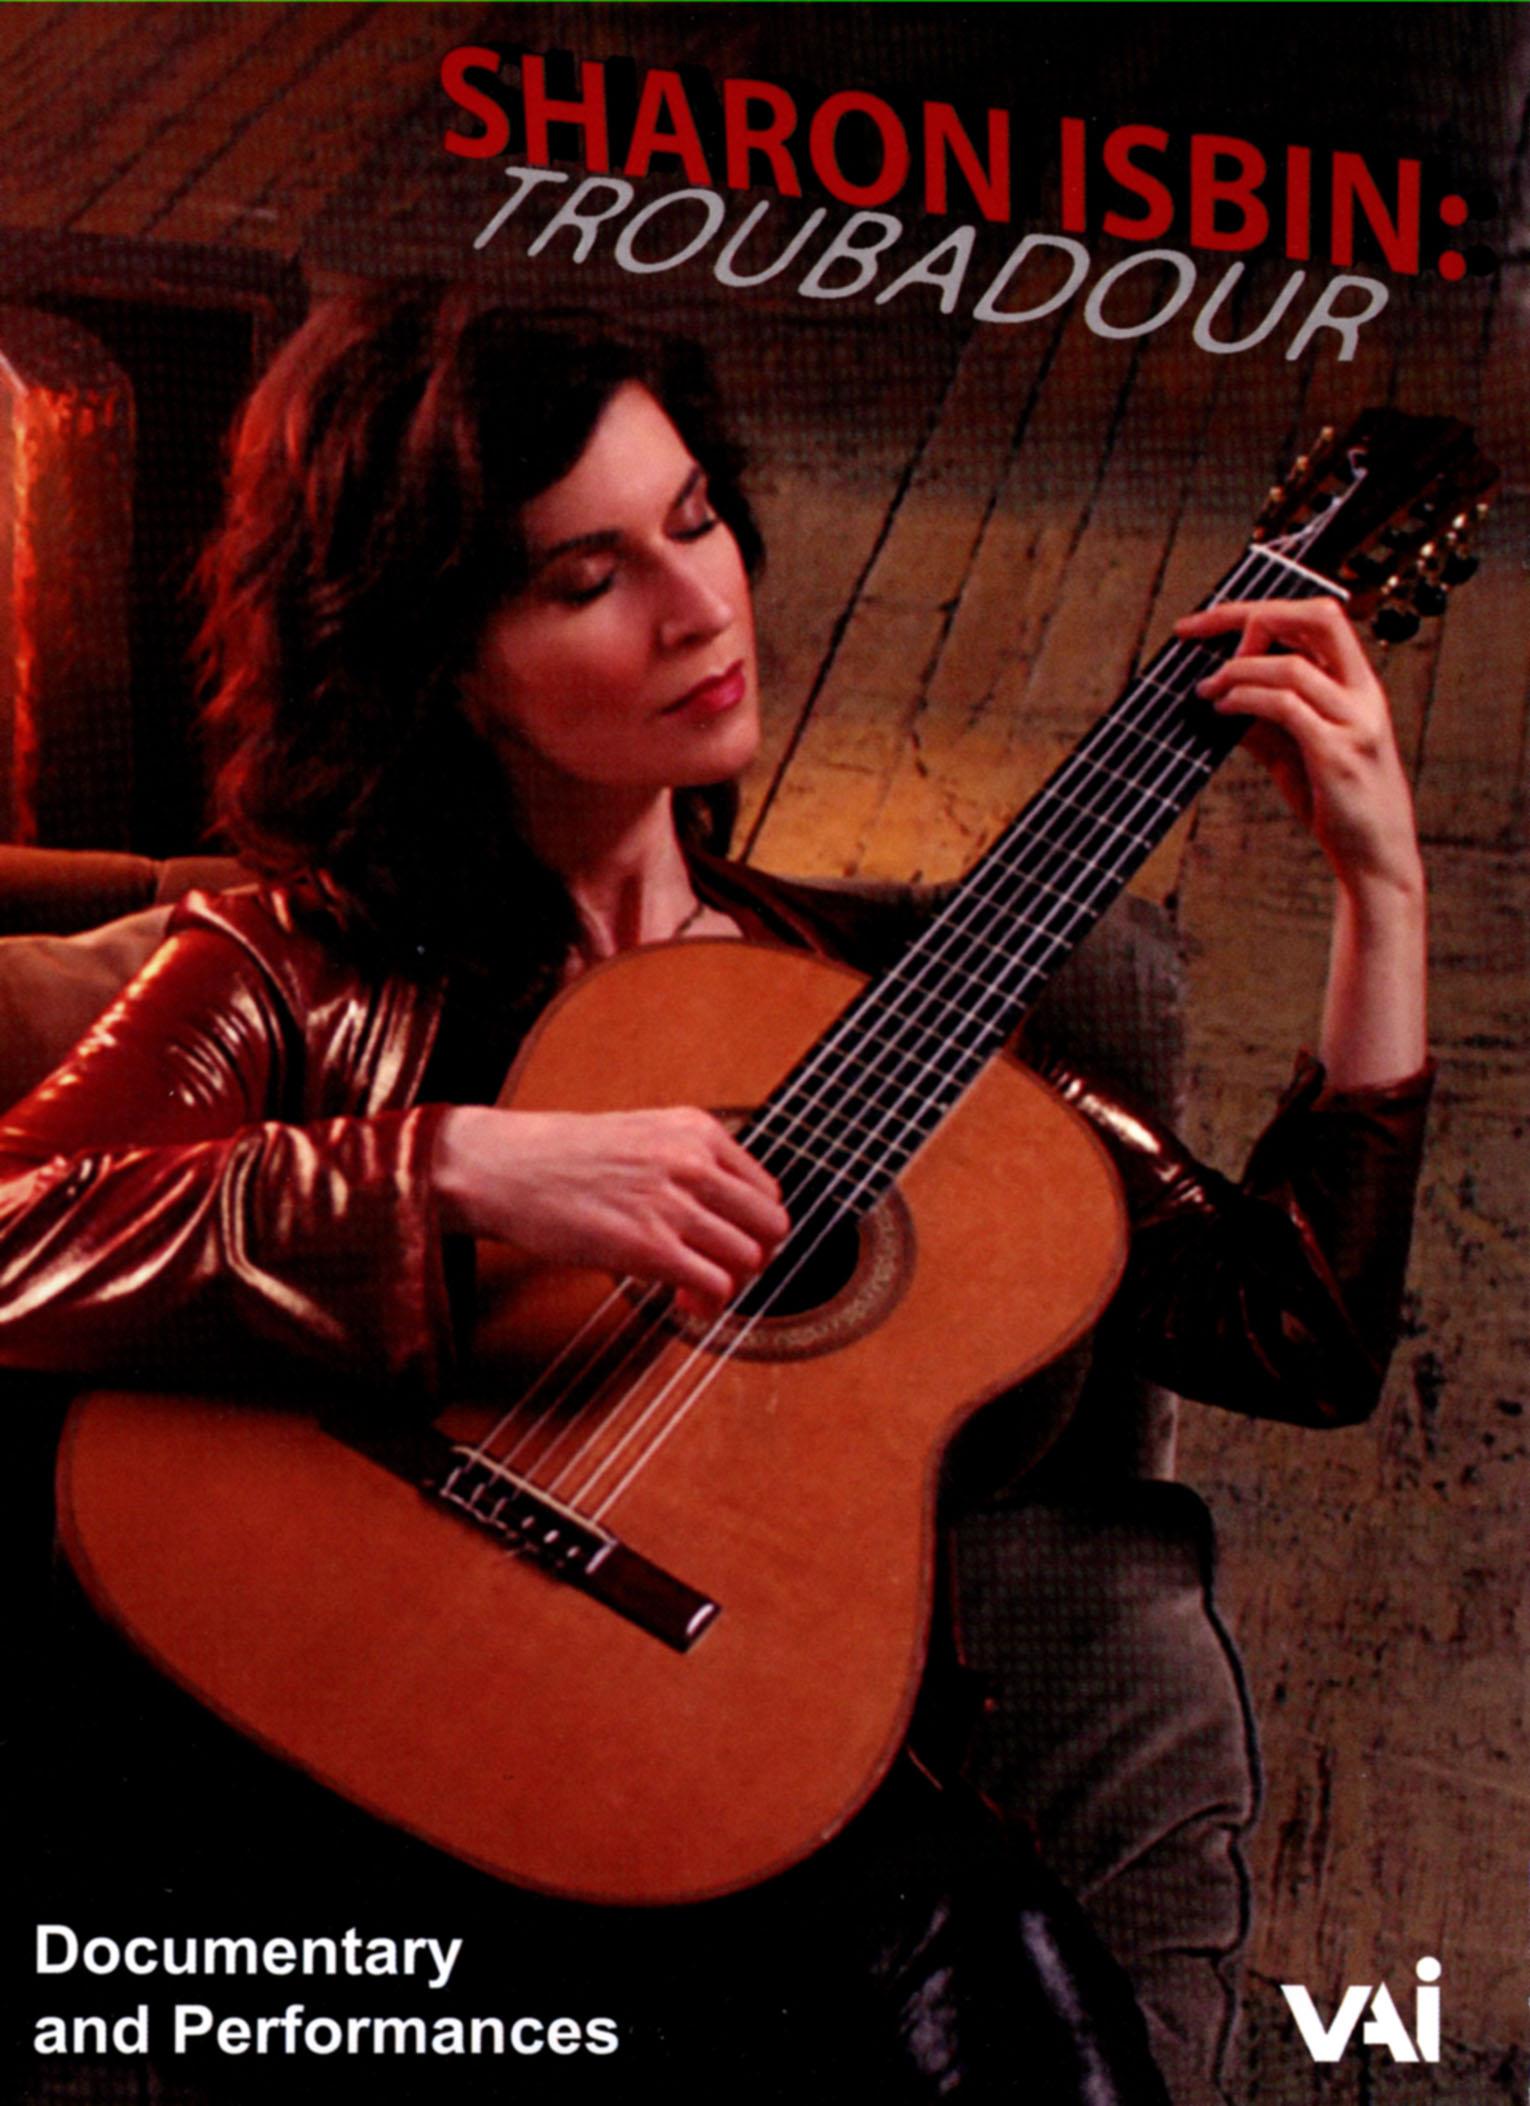 Sharon Isbin: Troubadour (dvd) 26897147